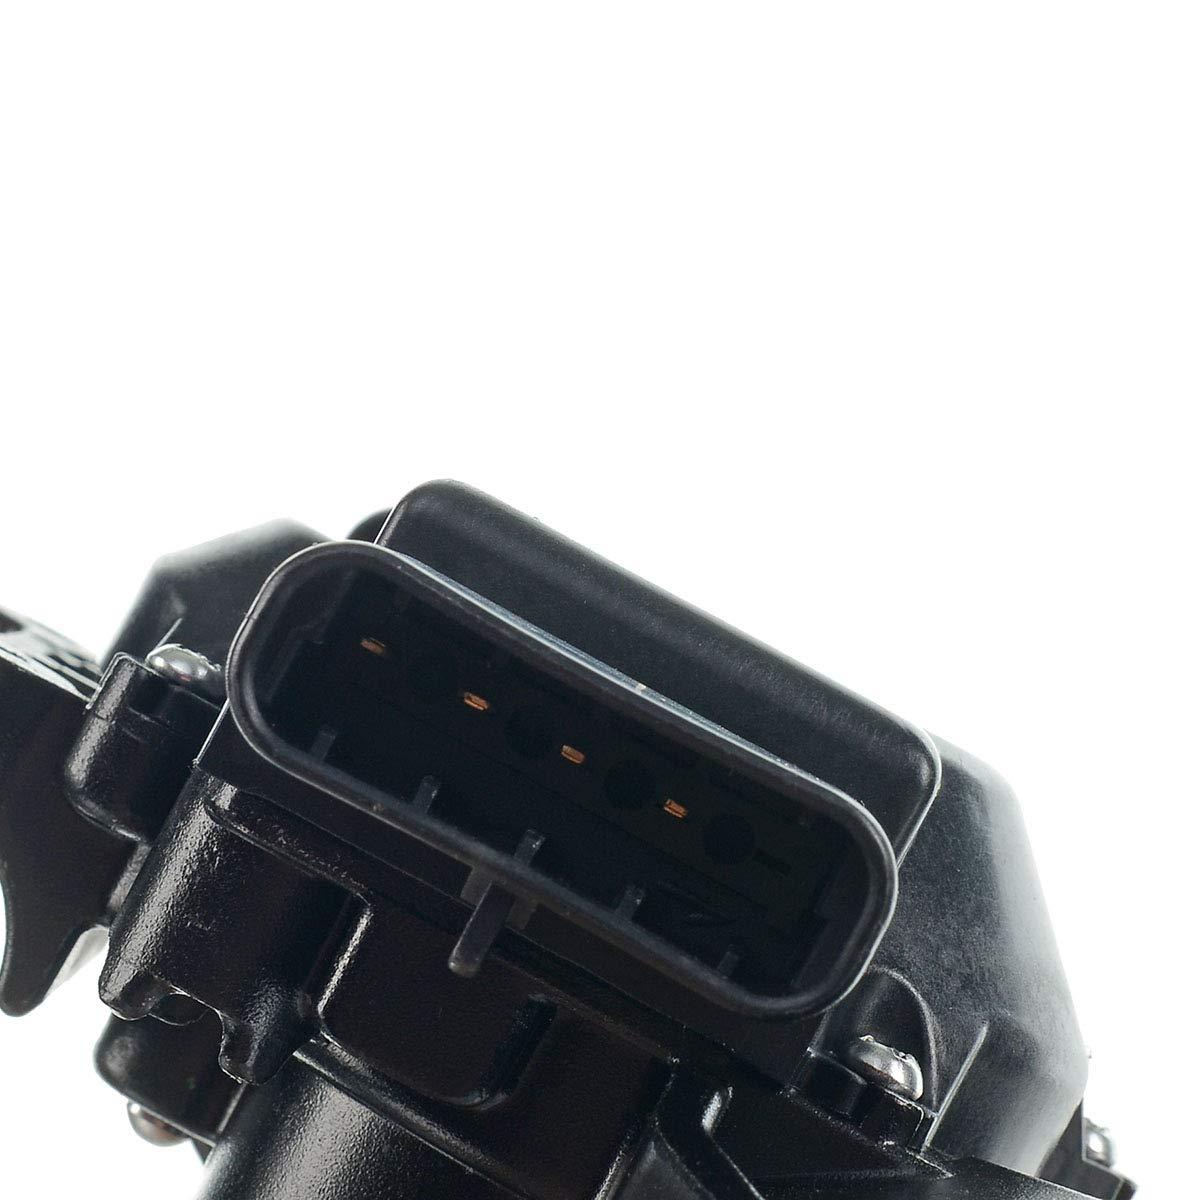 Front Windshield Wiper Motor for 2010-2016 Chevrolet Equinox GMC Terrain